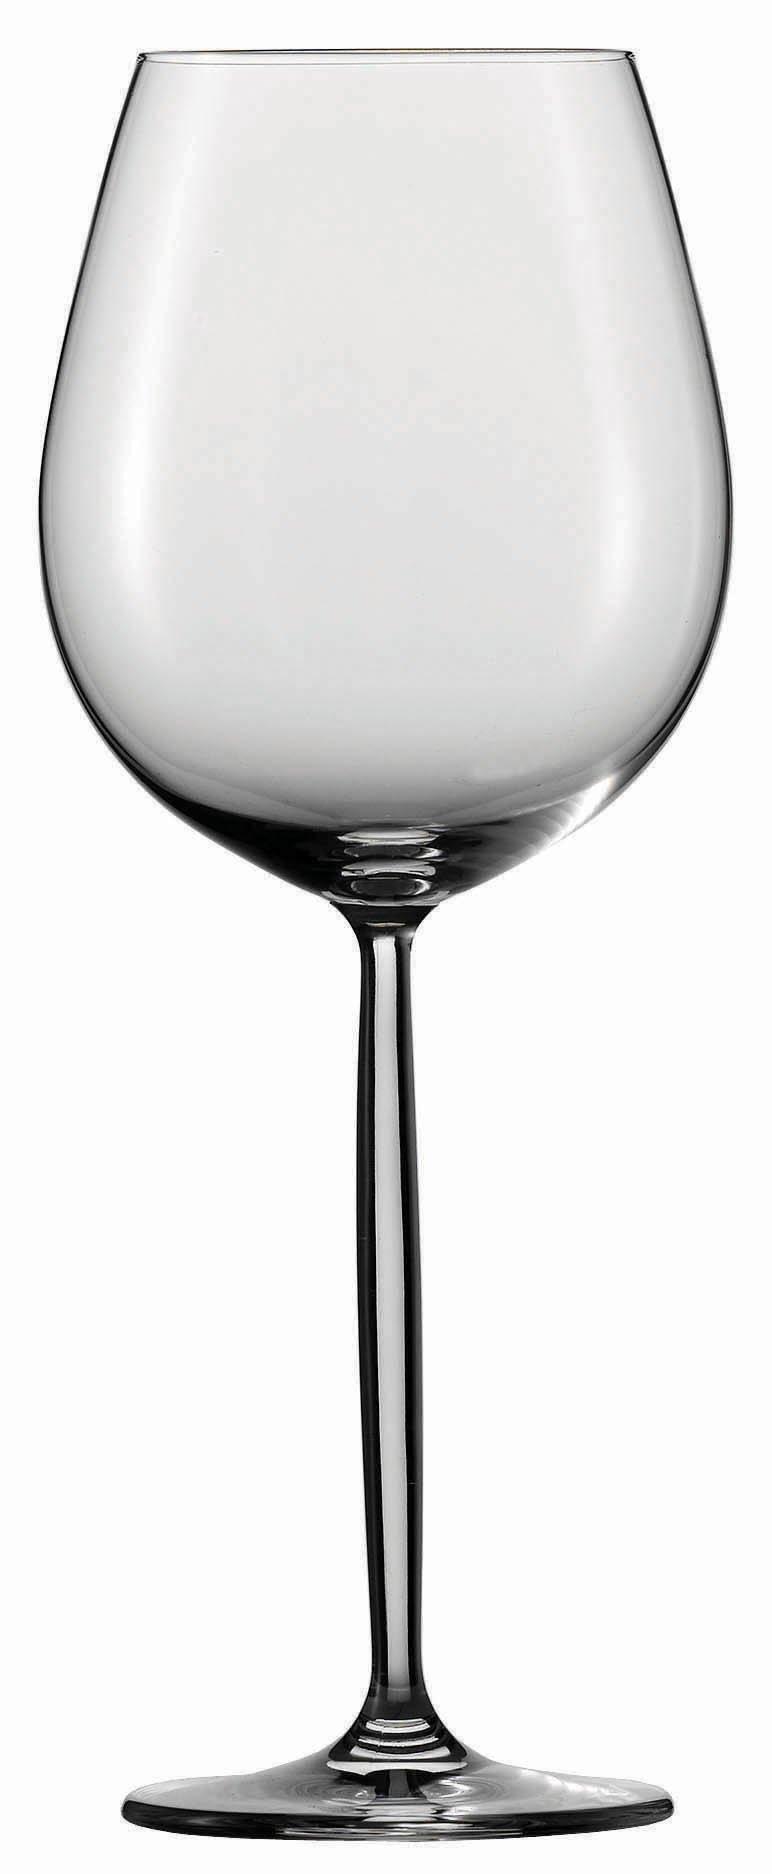 Schott Zwiesel Tritan Crystal Glass Diva Stemware Collection Burgundy Red Wine Glass, 15-1/2-Ounce, Set of 6